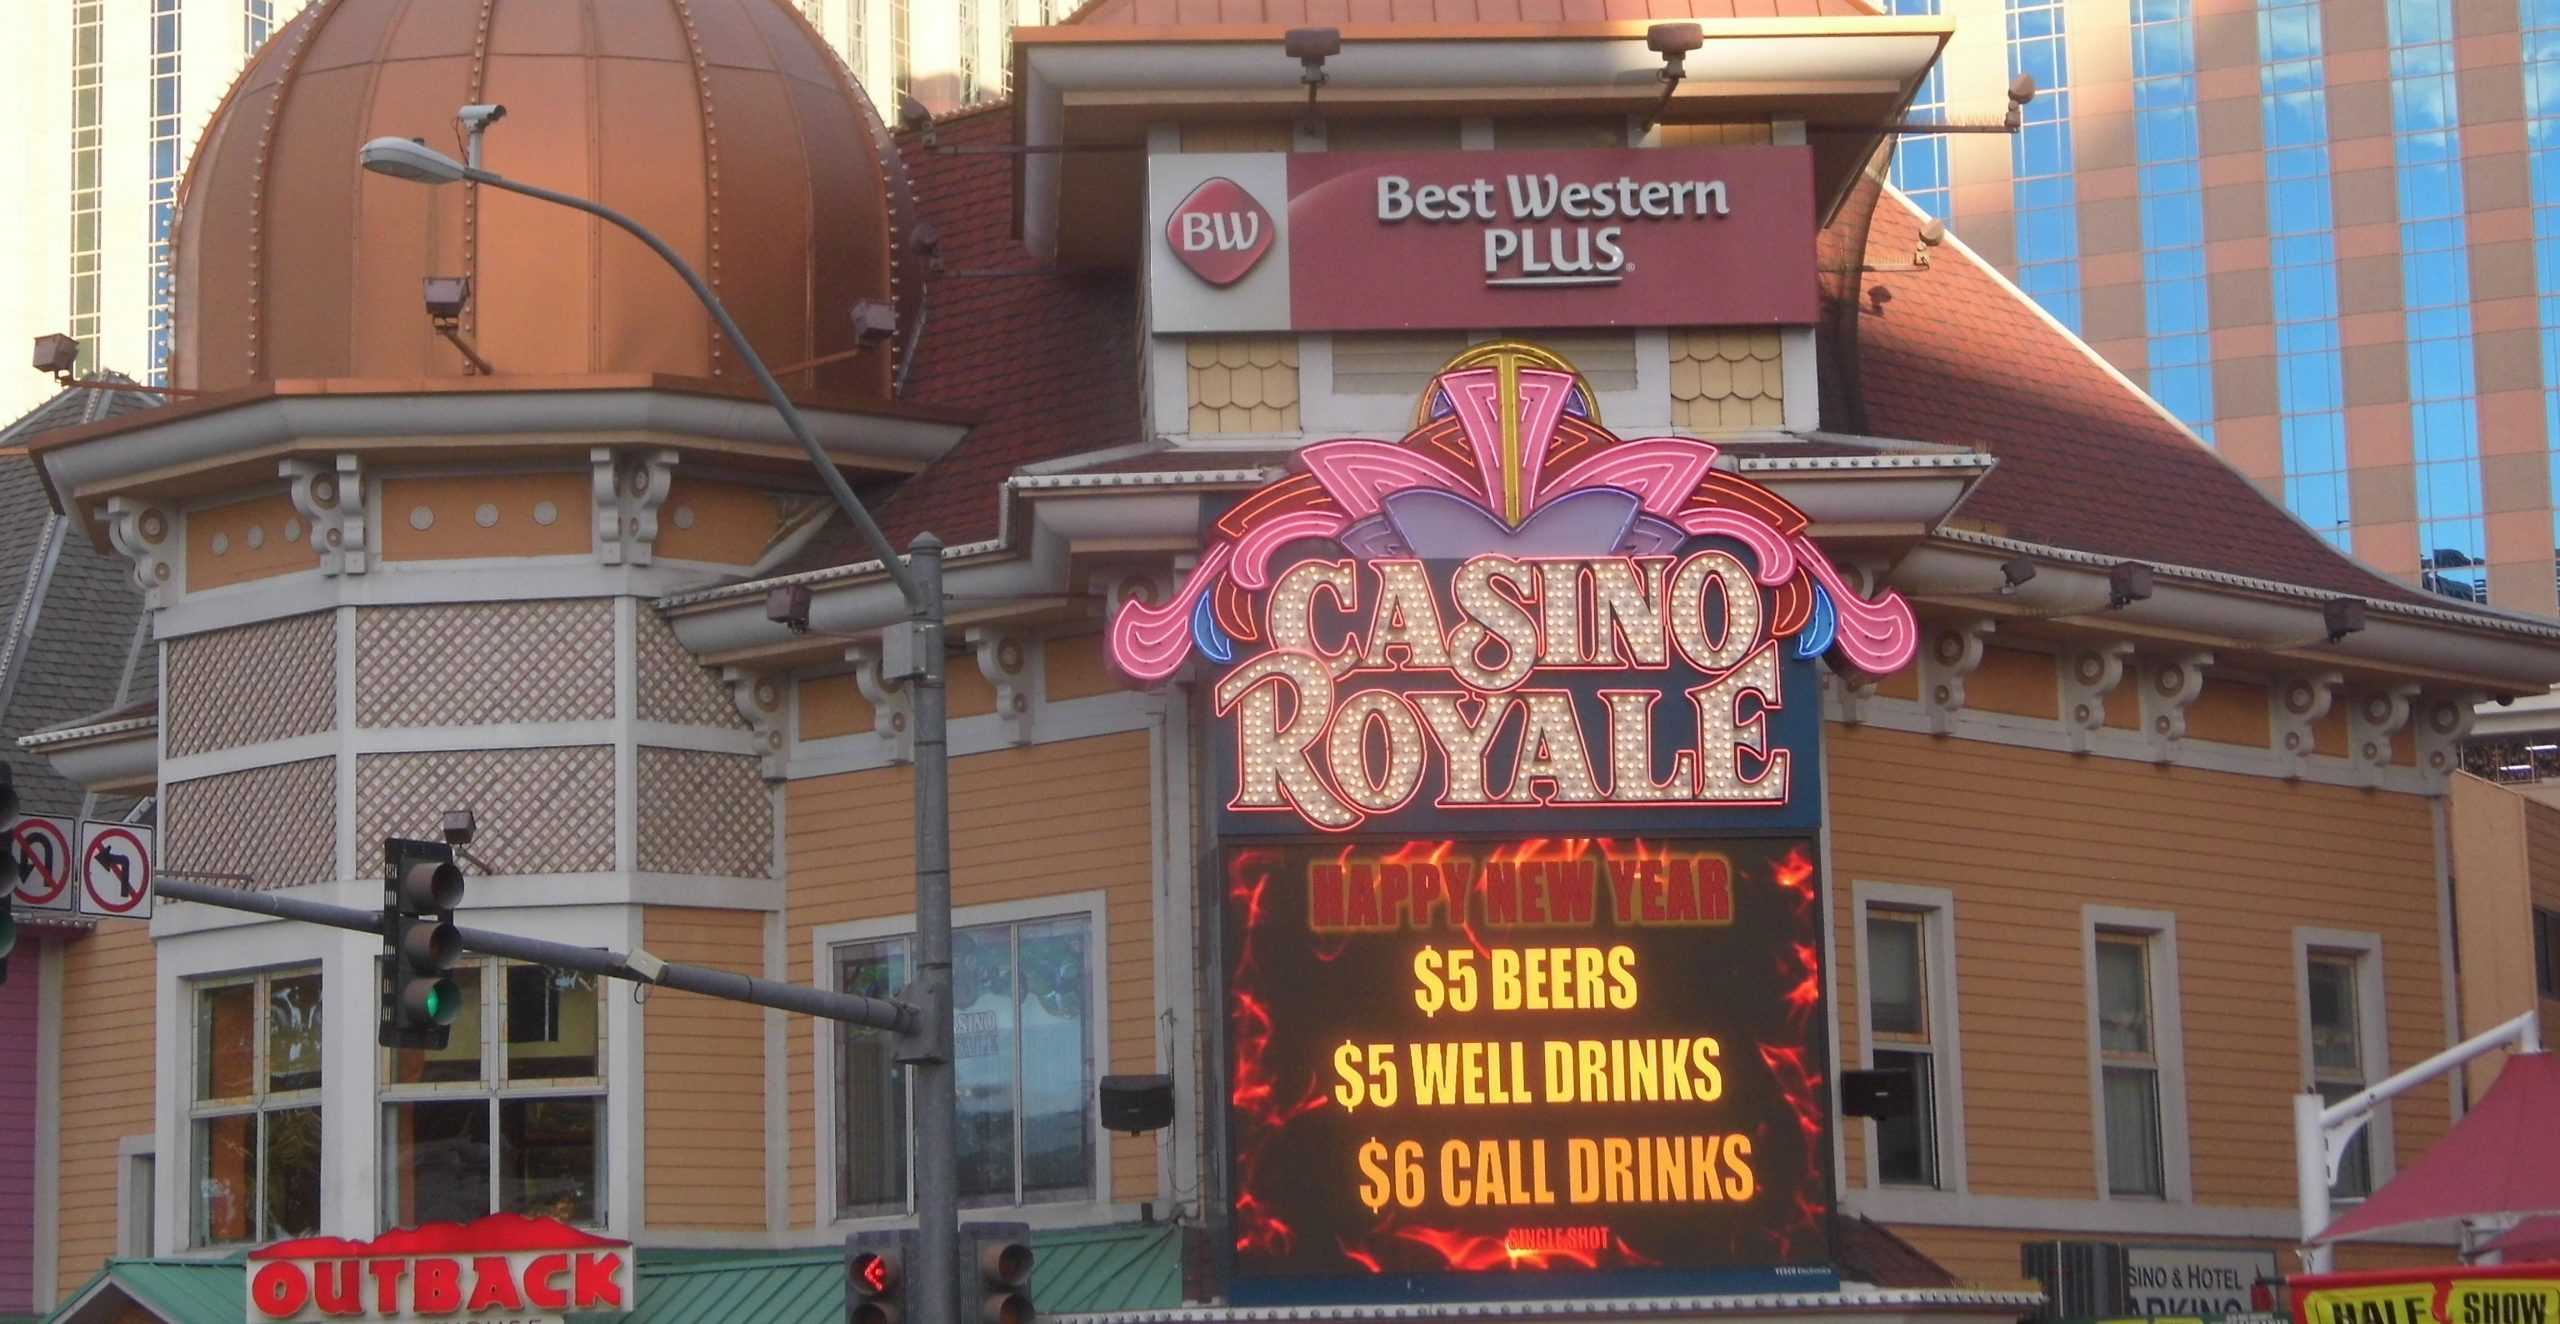 Casino Royale Hotel and Casino 2019, Casino Royale Hotel and Casino, Casino Royale Hotel and Casino, Las Vegas 2018, Las Vegas 2019, Smallest Casino on Las Vegas Strip, Casino Royale Hotel and Casino